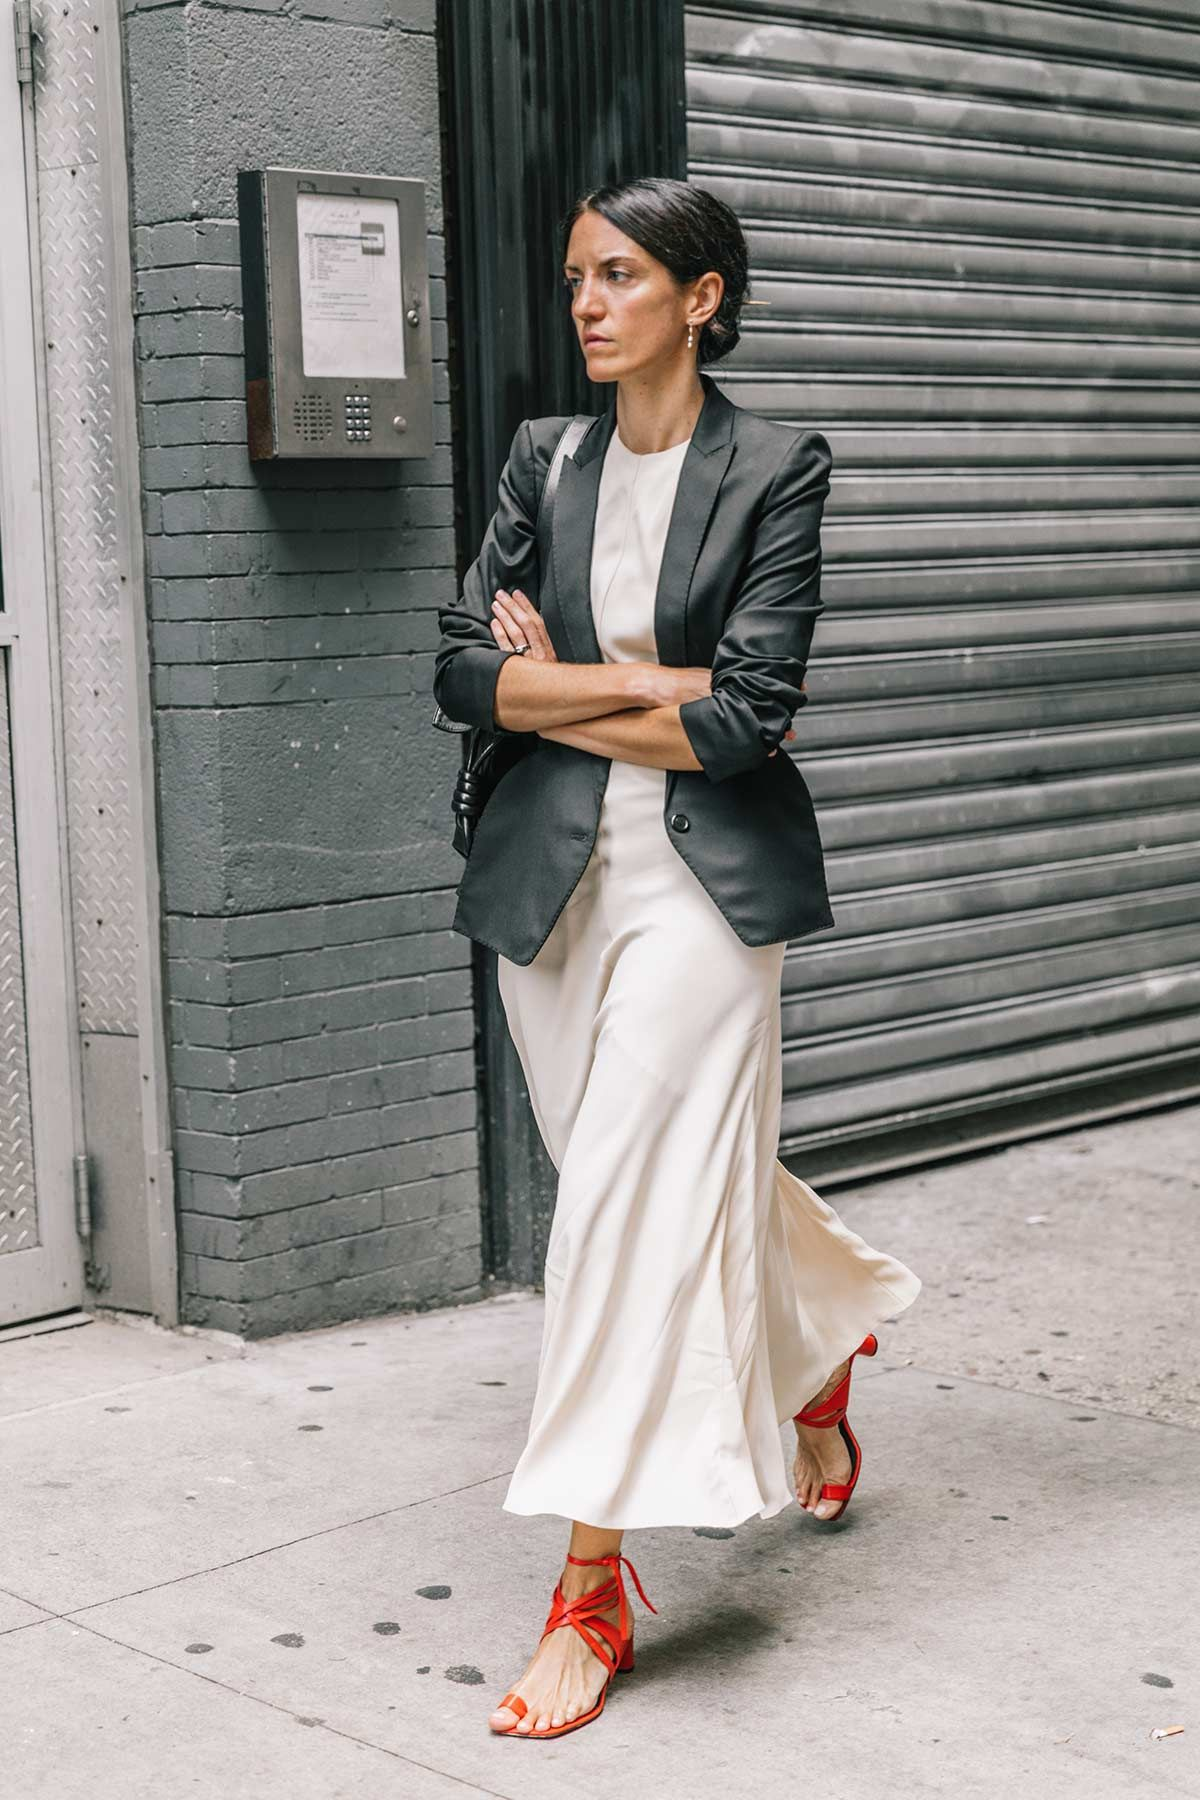 Pin by kanica jain on style pinterest black blazers white dress